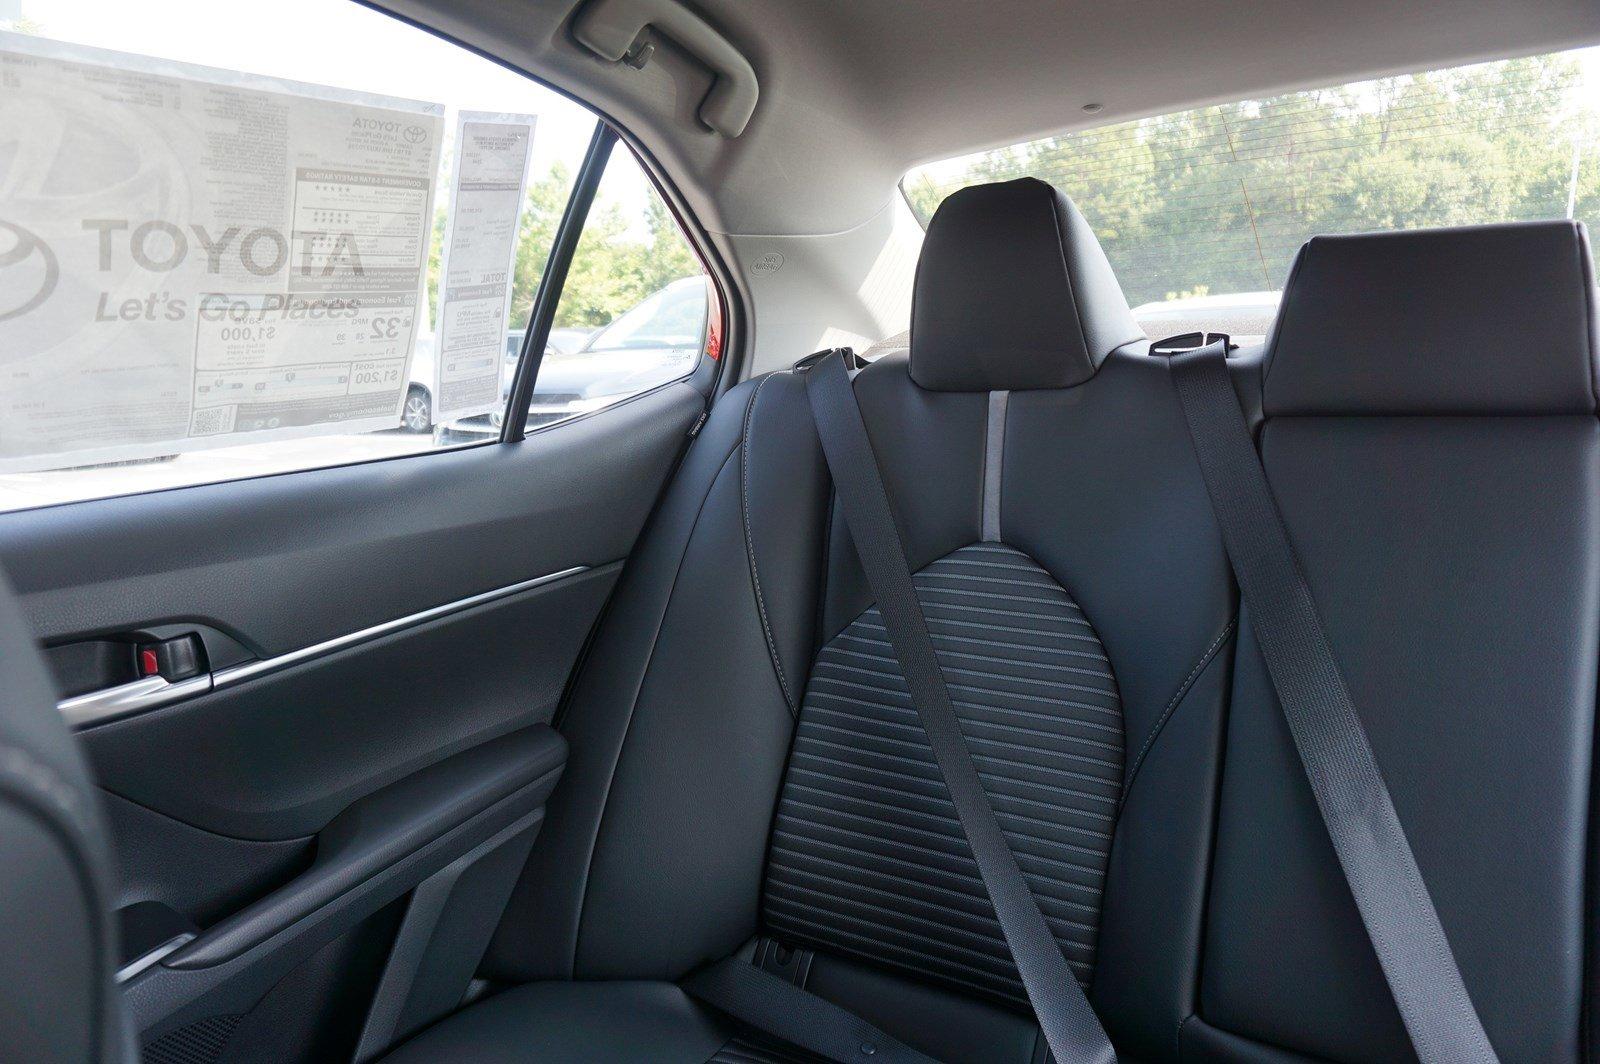 New 2019 Toyota Camry SE